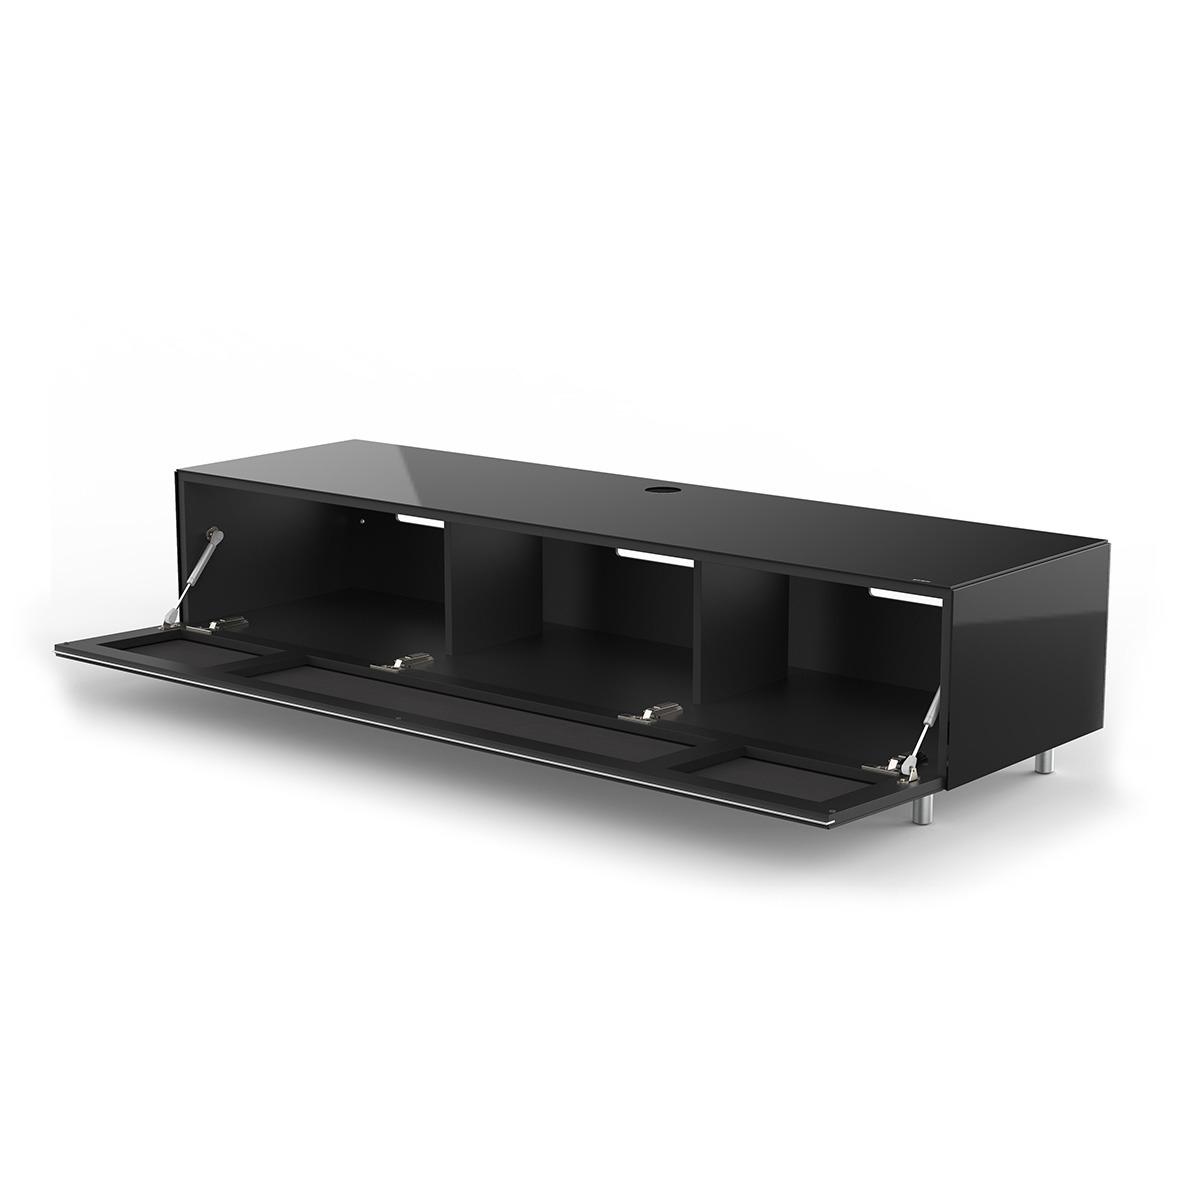 Afbeelding van Just Racks JRL1654T-BG TV meubel